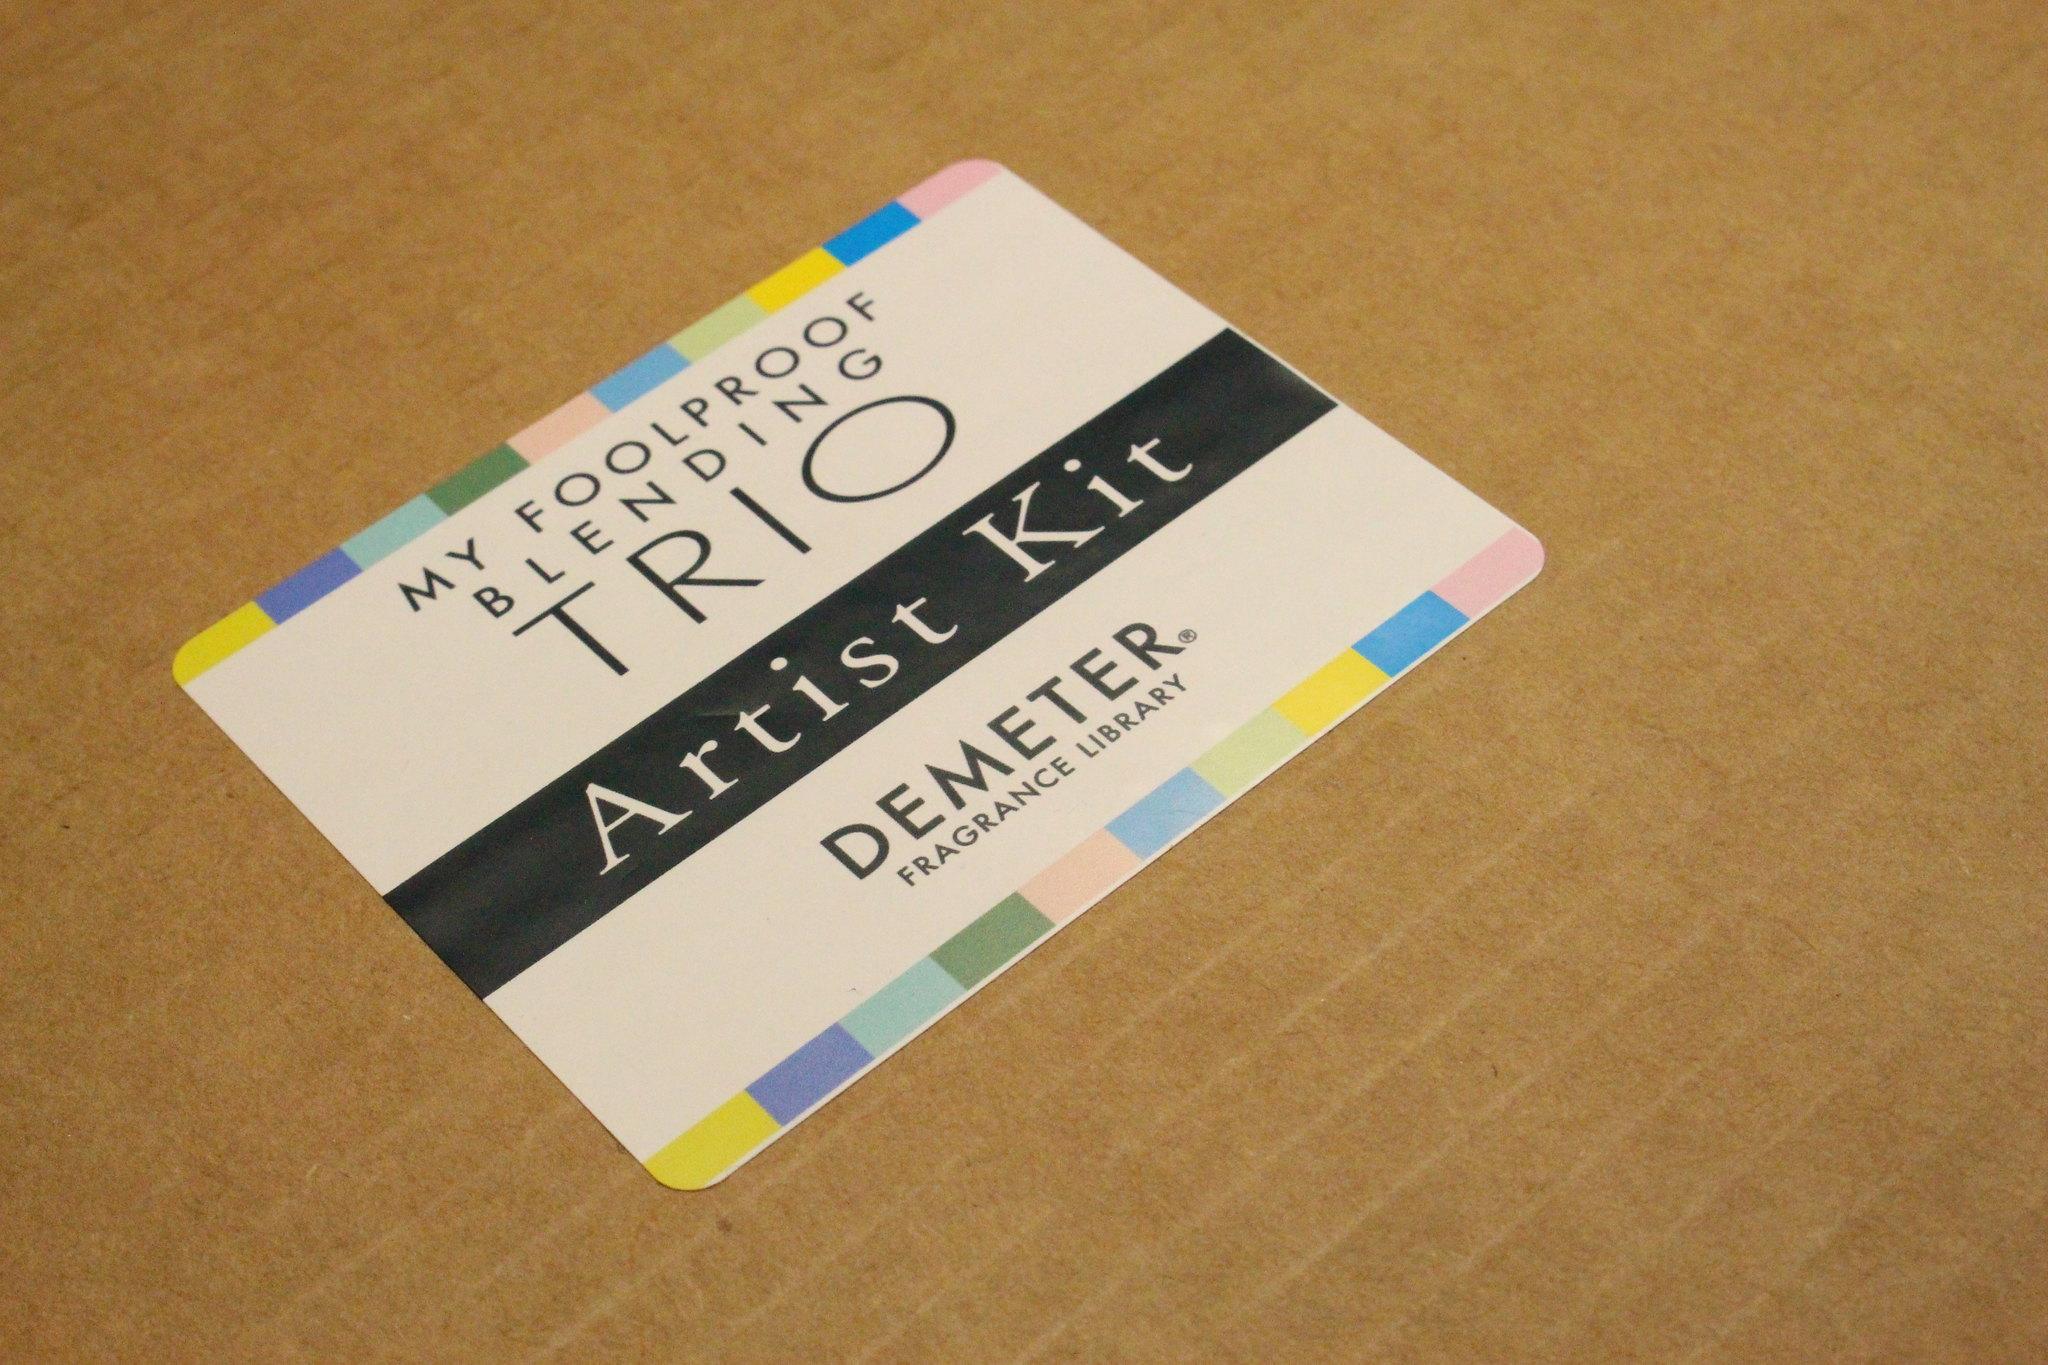 Demeter Fragrance Library Foolproof Blending Trio Artist Kit